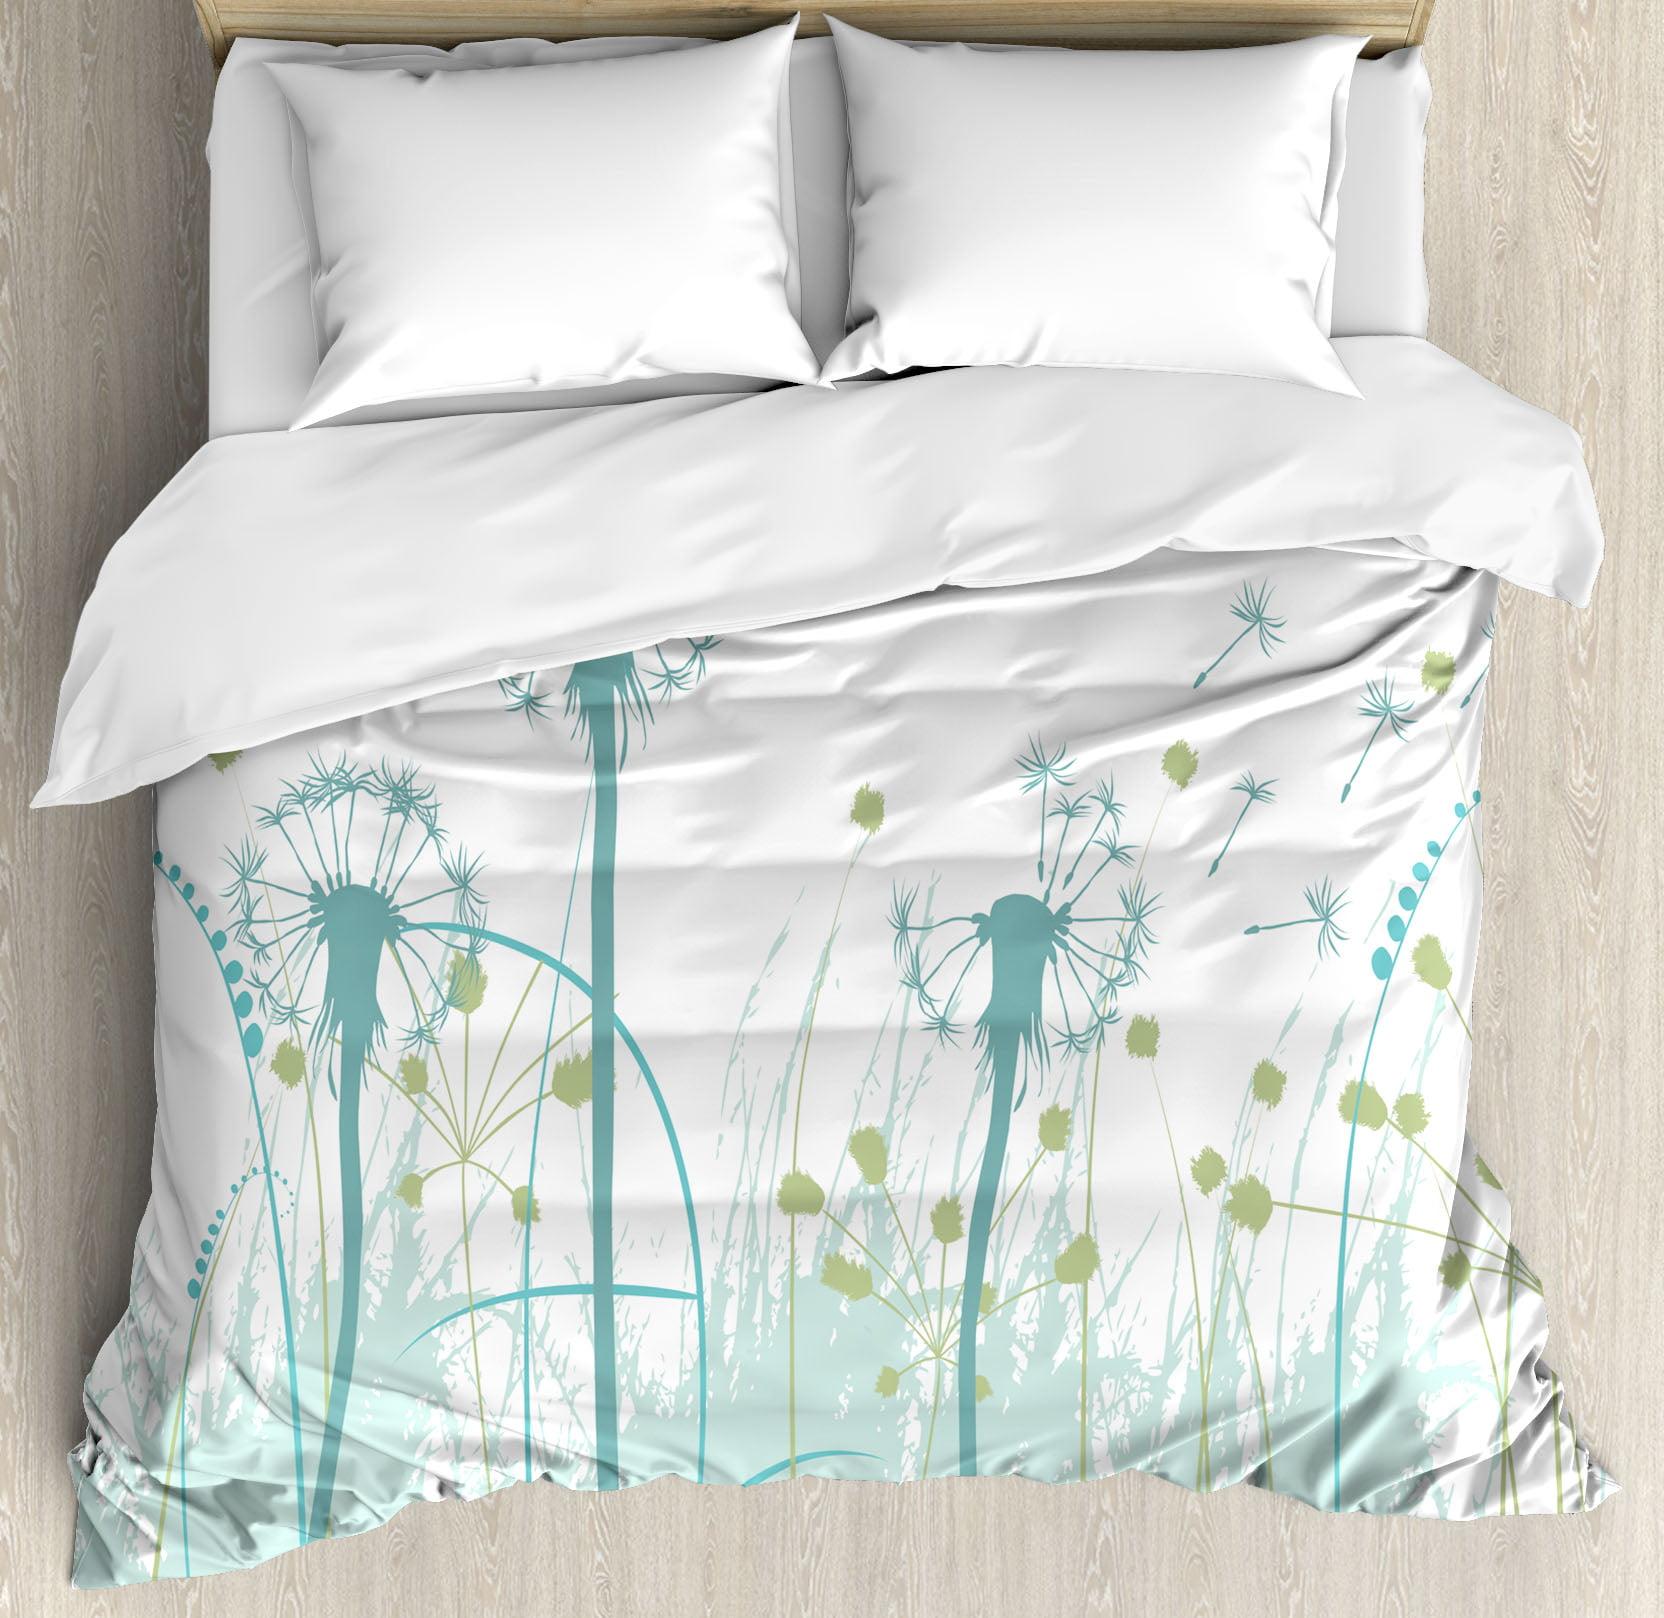 Spring Queen Size Duvet Cover Set, Silhouette Dandelion F...